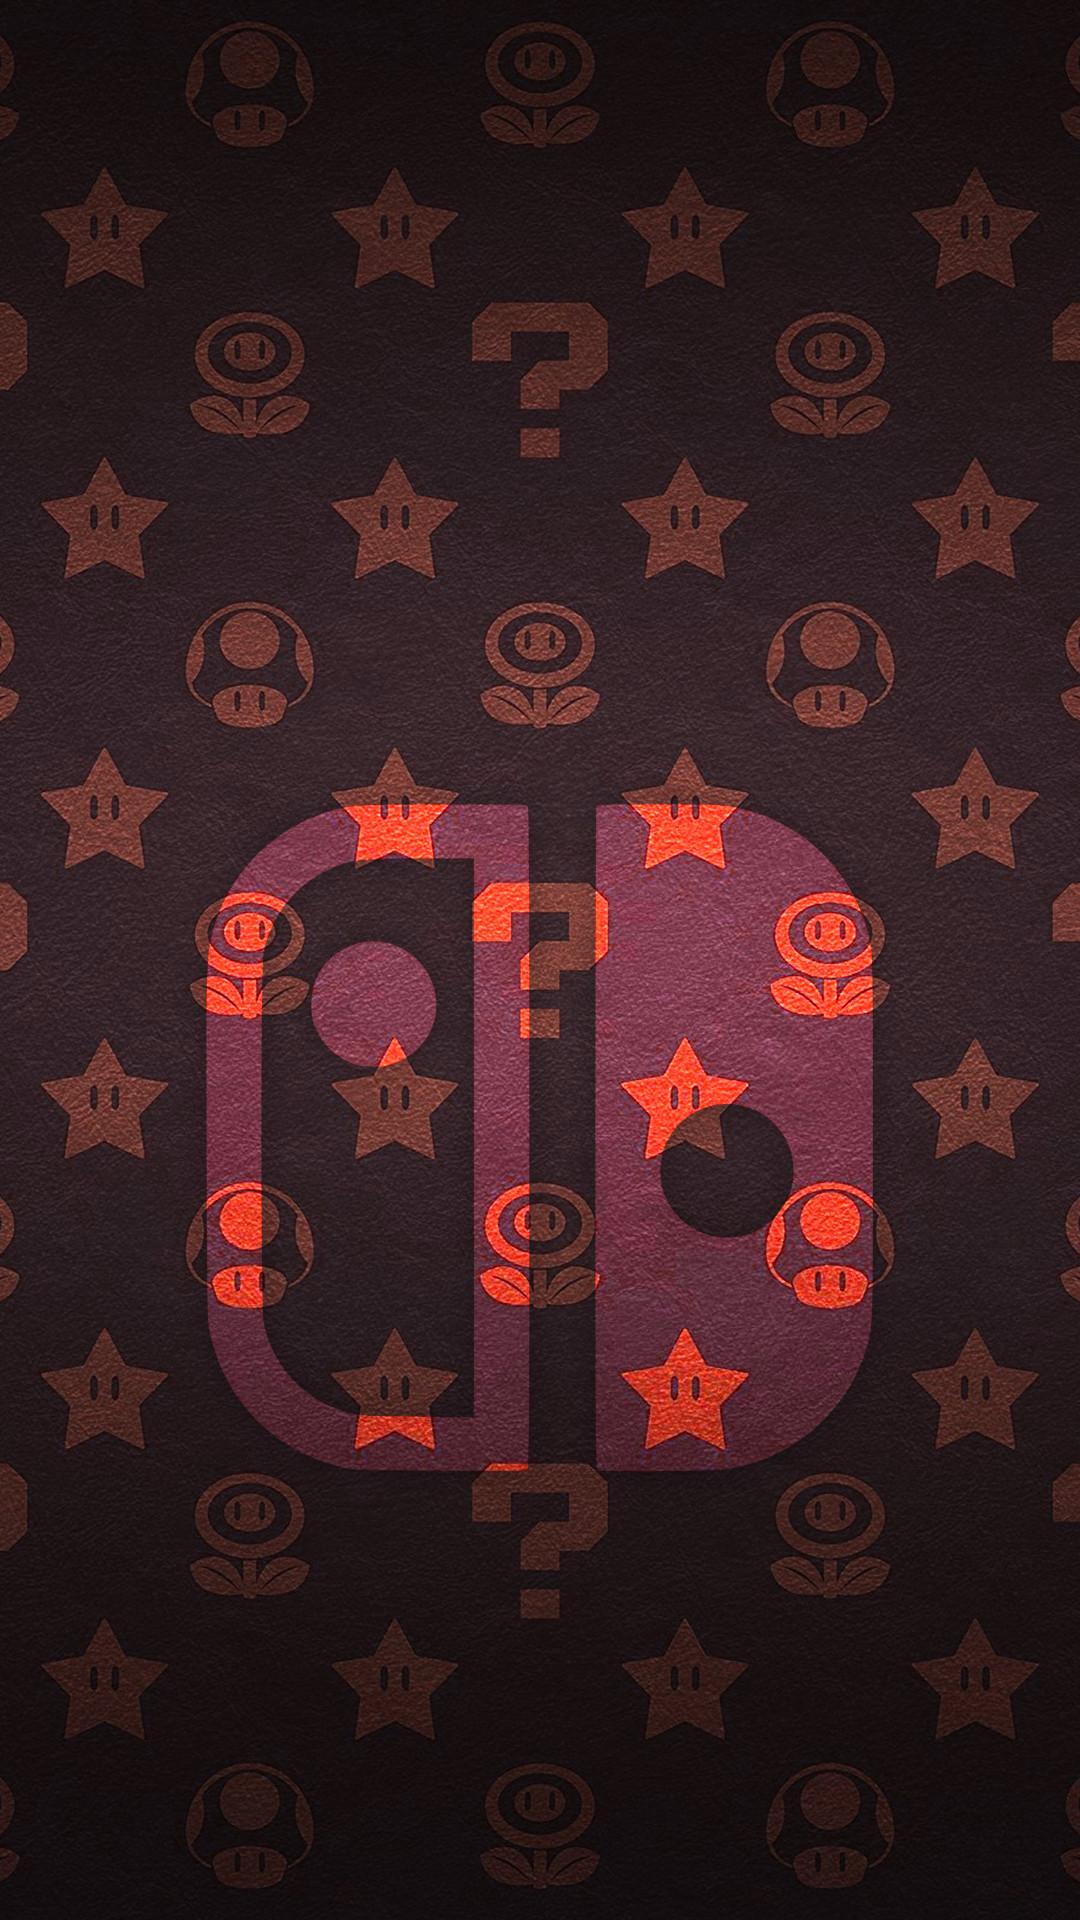 (iPhone 7 Plus) Low Logo. 1920×1080 wallpaper